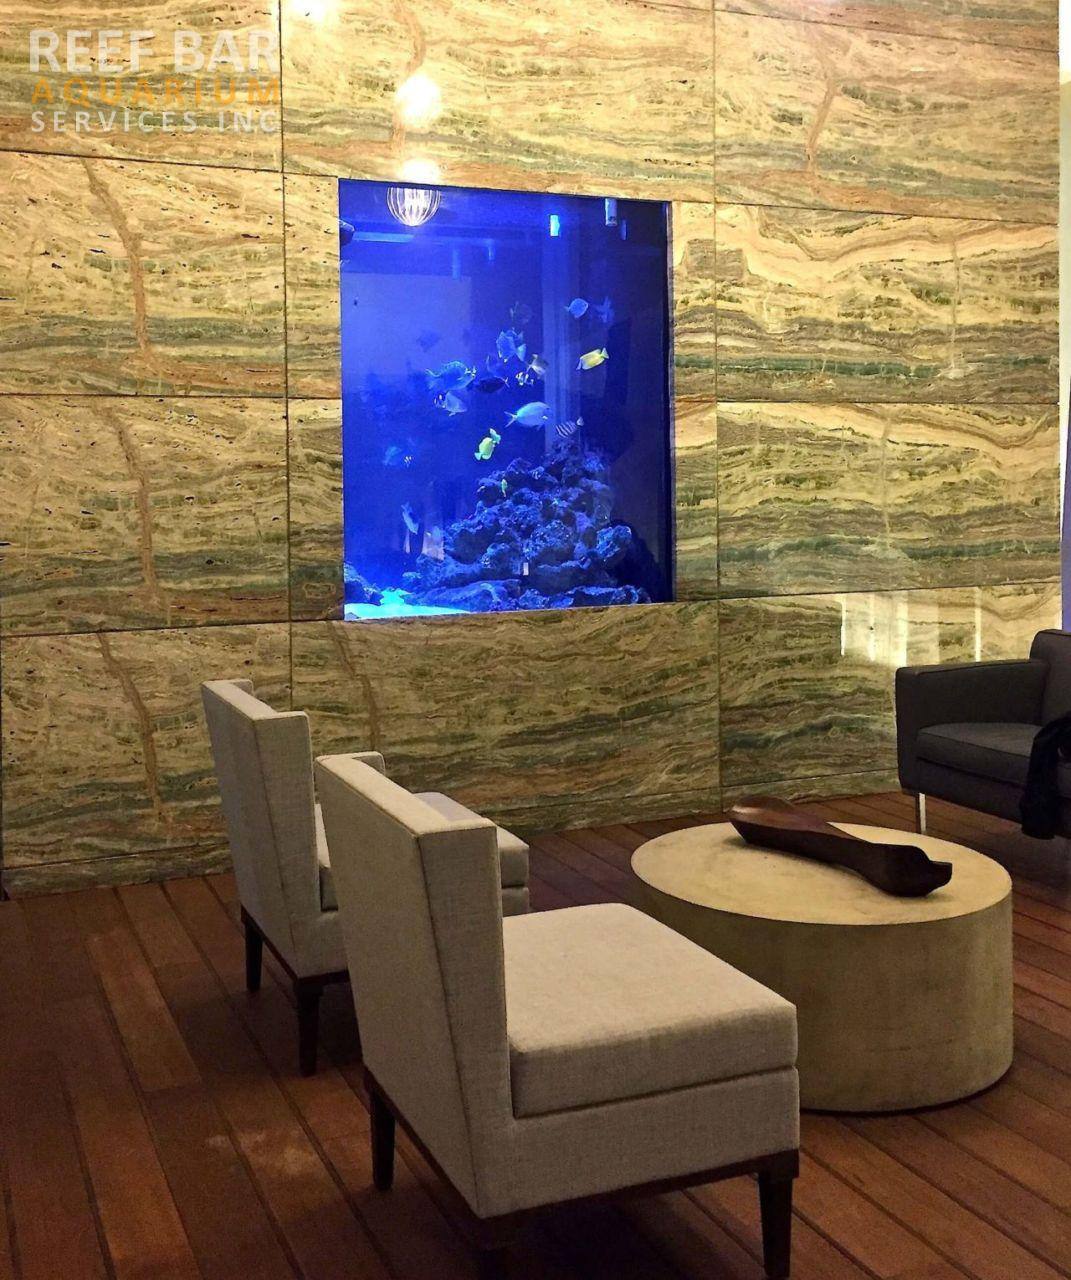 1000 Gallon Saltwater Tank - Reef Bar Aquarium Services - reef-bar.com